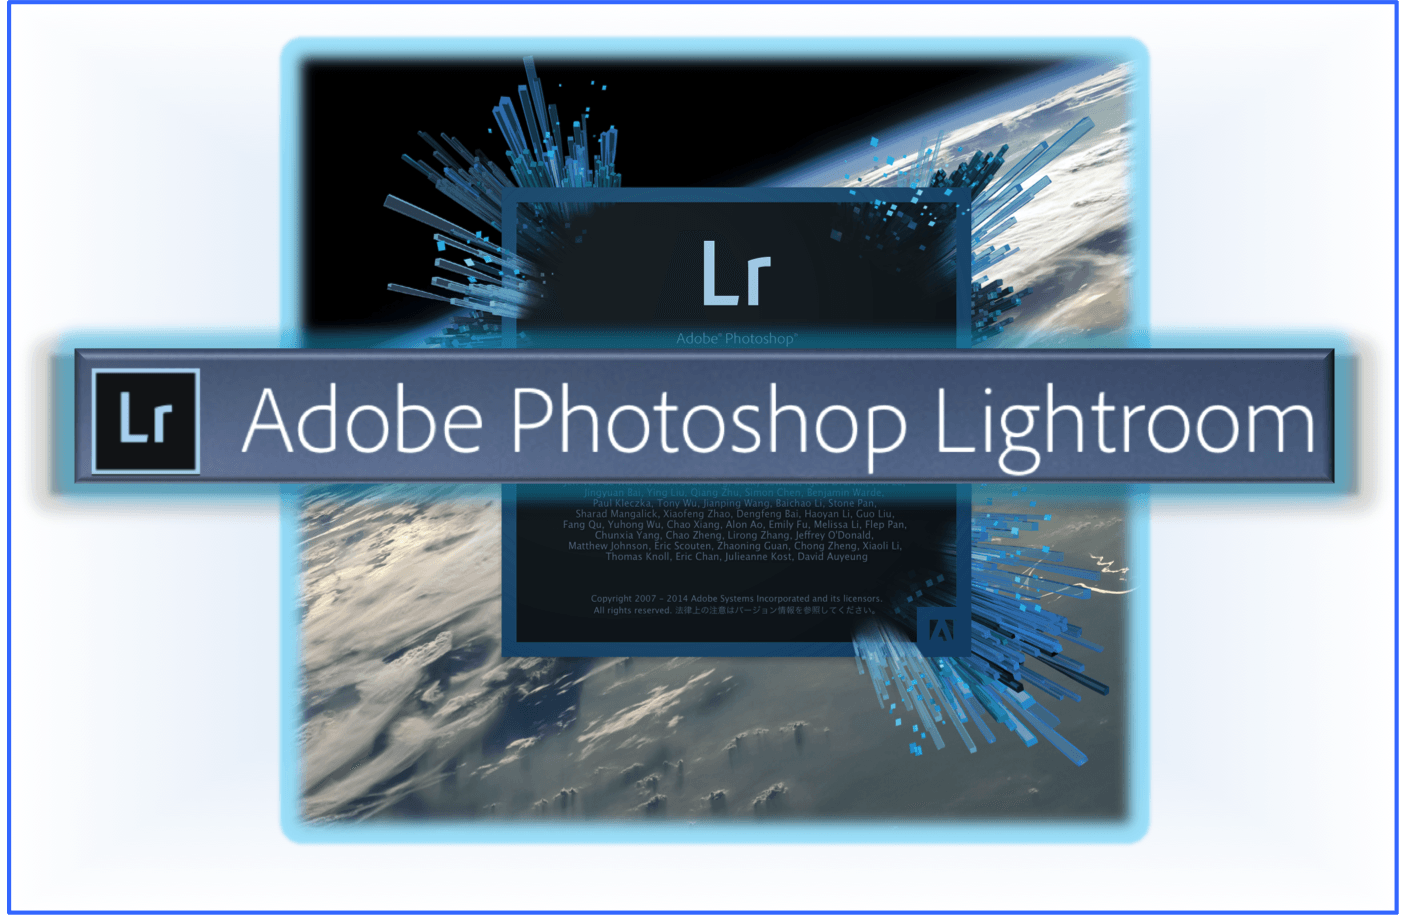 Adobe Photoshop Lightroom5初心者でも写真を劇的に変えられる3つのオススメ編集項目